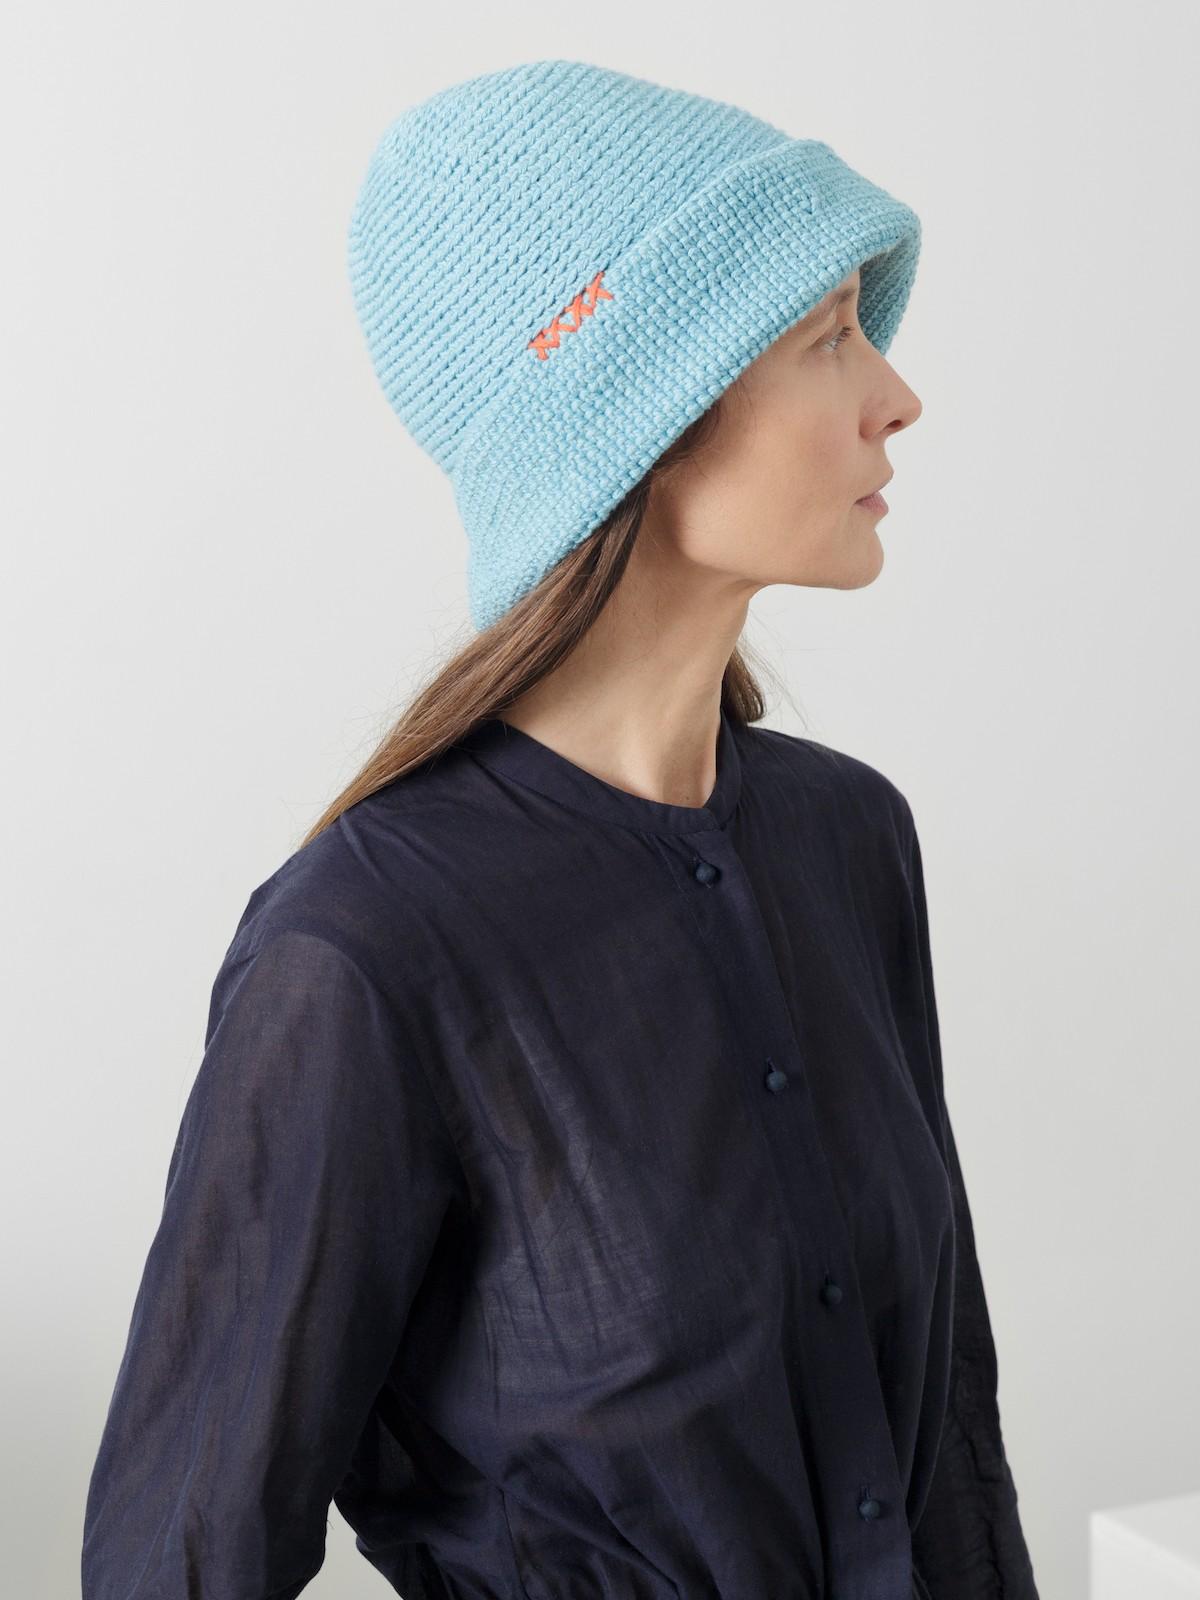 Crochet boat hat Image